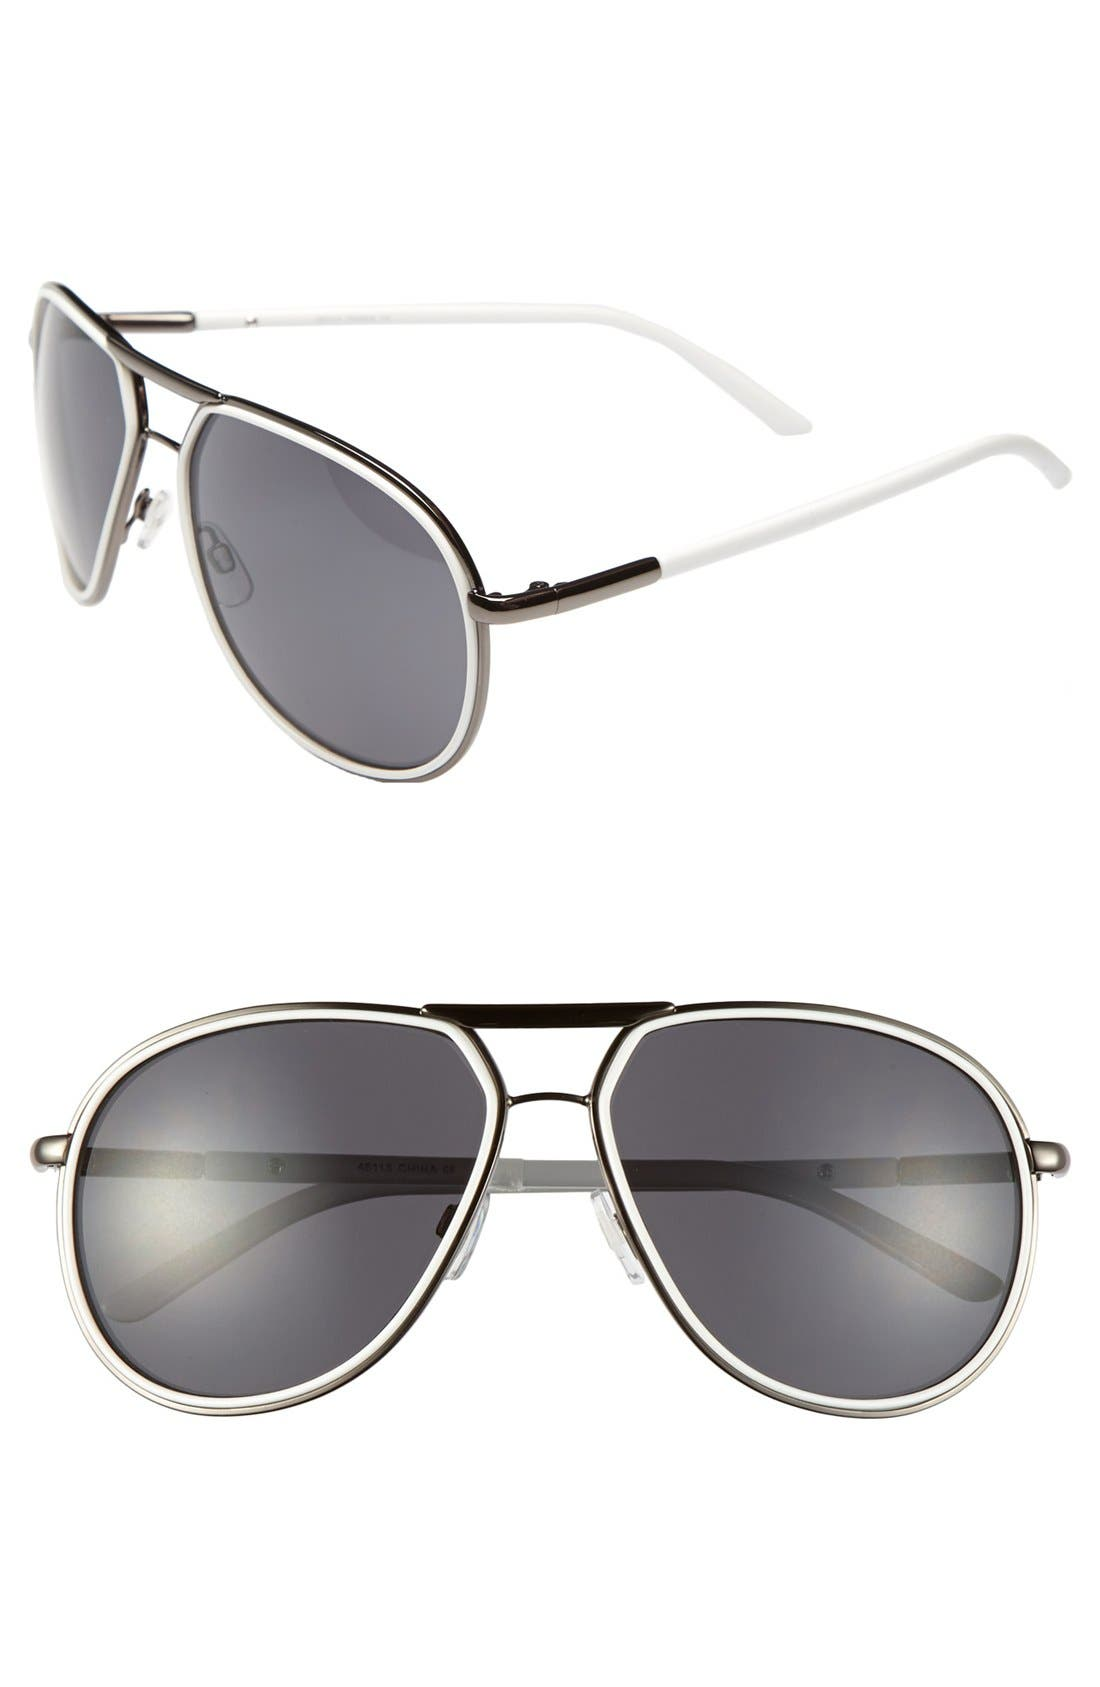 Alternate Image 1 Selected - A.J. Morgan 'Dream' Aviator Sunglasses